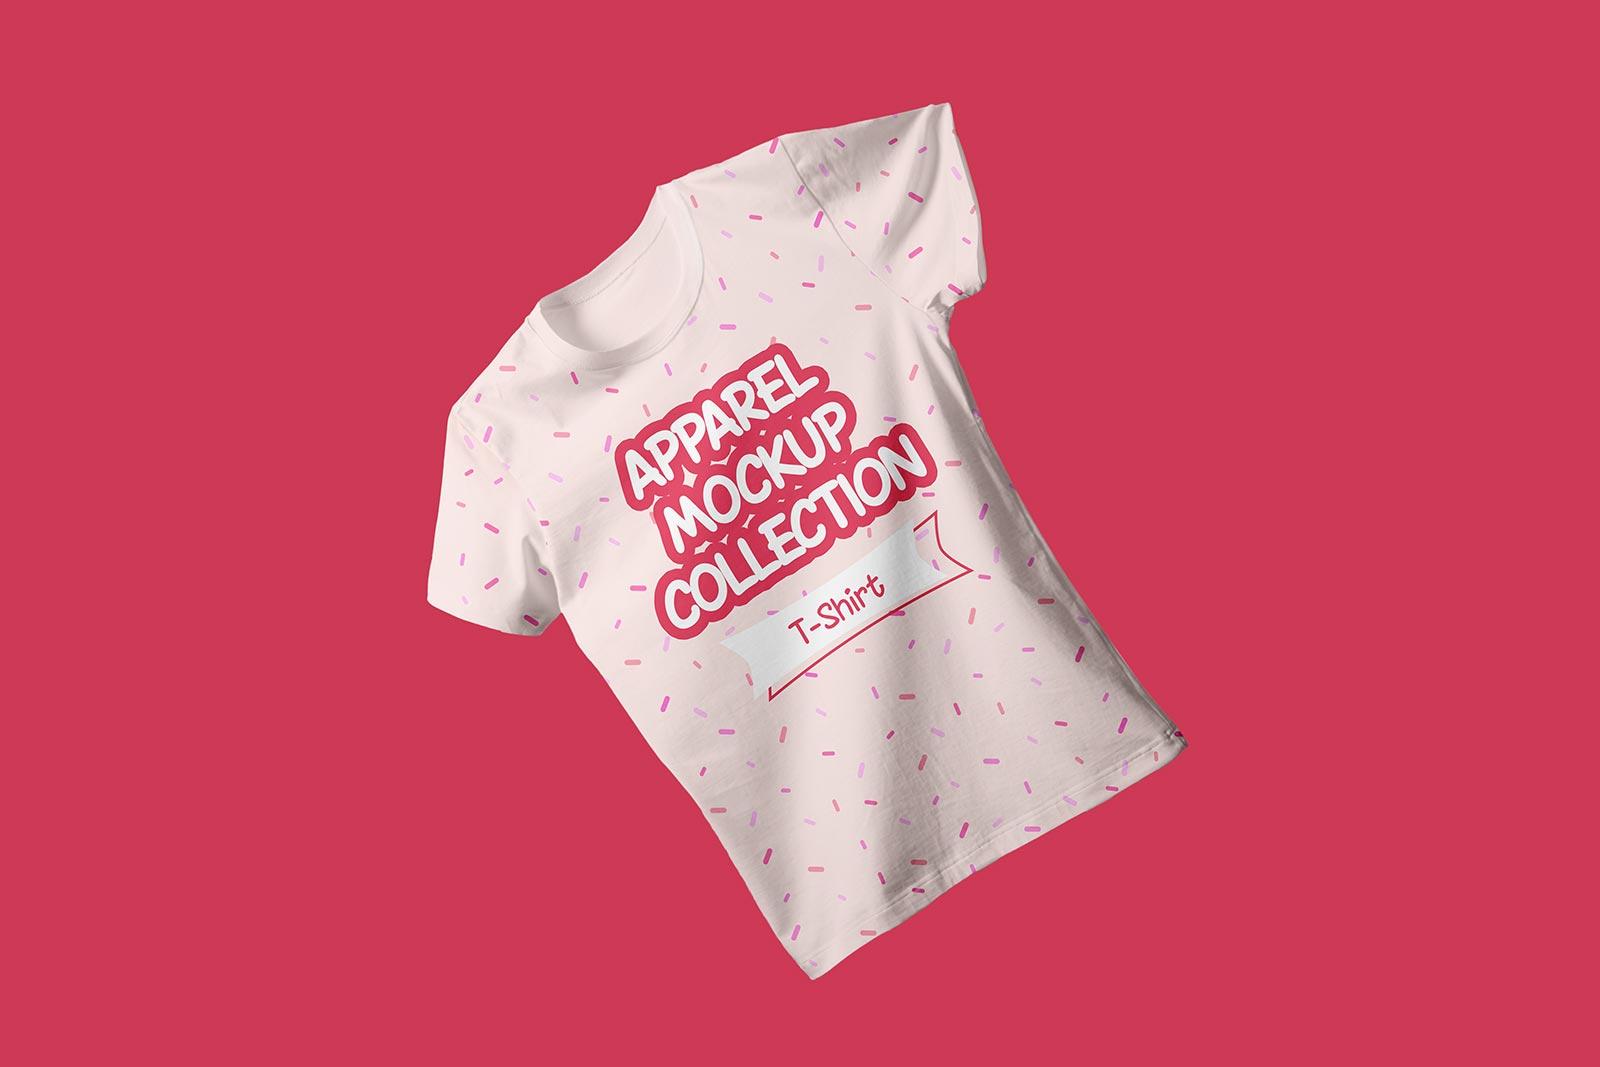 Free Floating Half sleeves T-shirt Mockup PSD